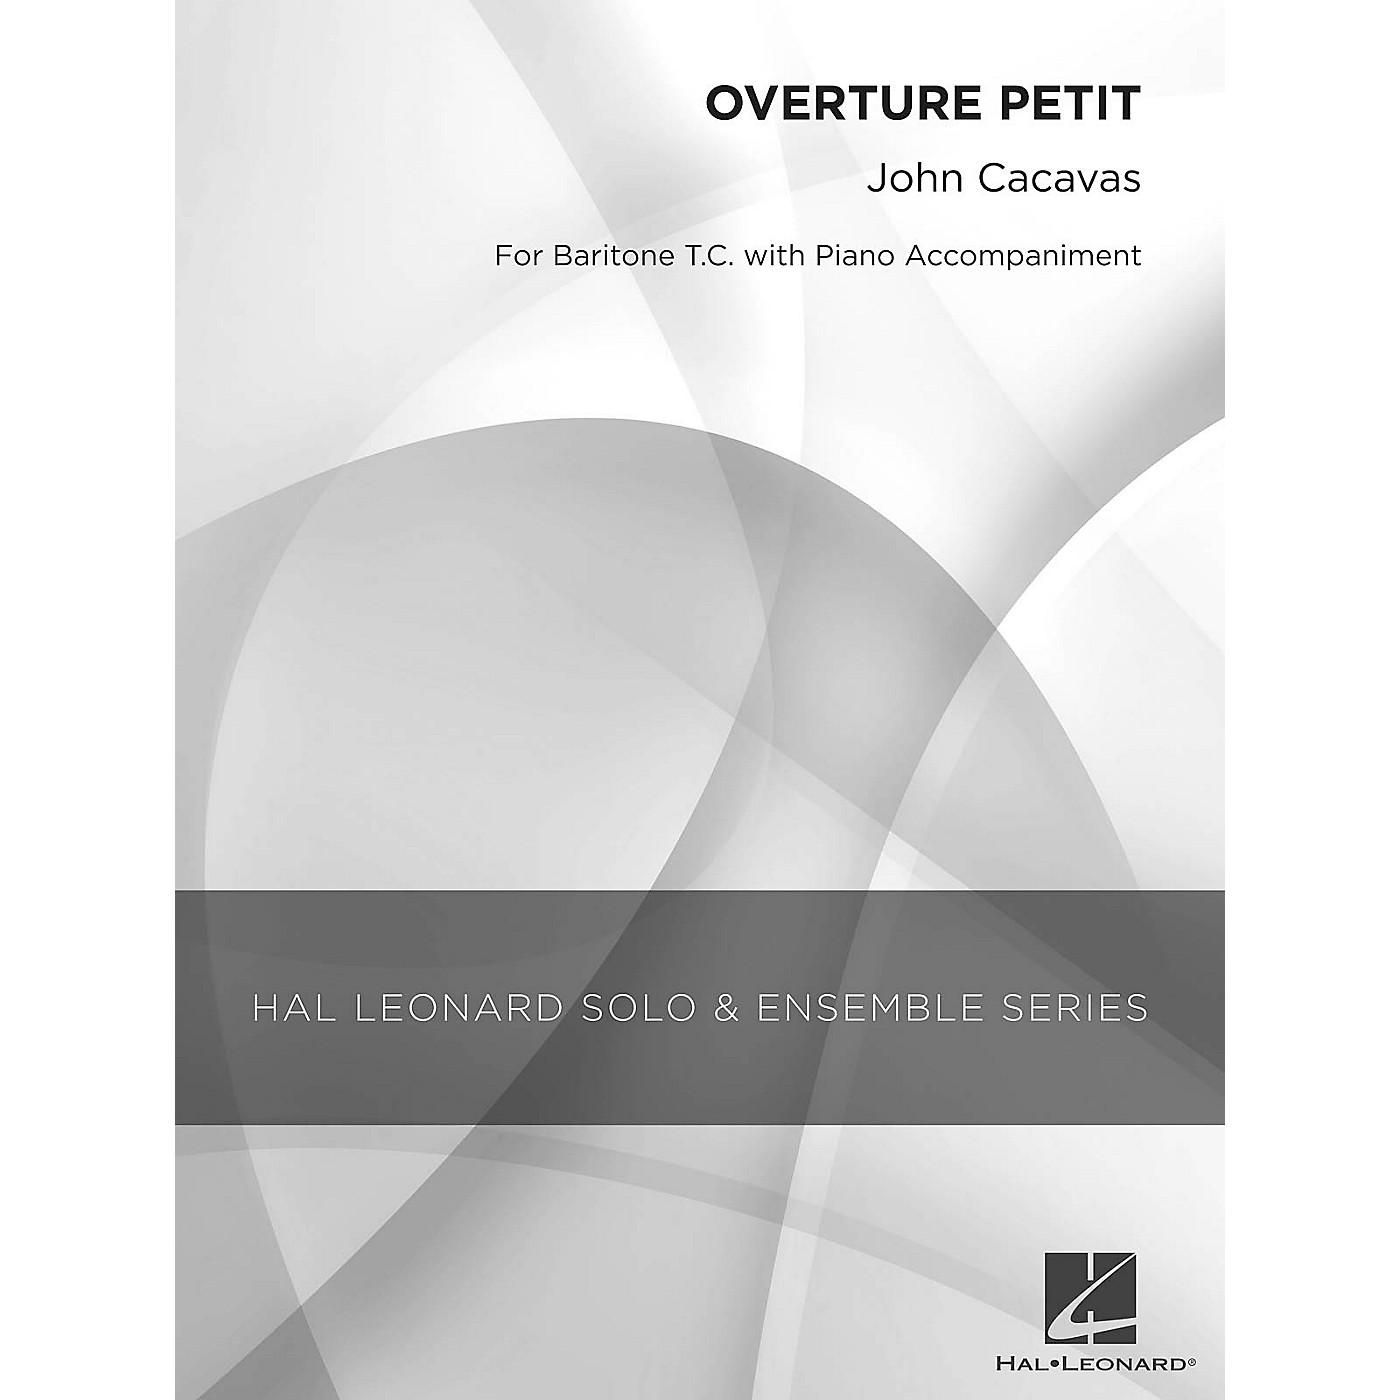 Hal Leonard Overture Petit (Grade 3 Baritone T.C. Solo) Concert Band Level 3 Composed by John Cacavas thumbnail